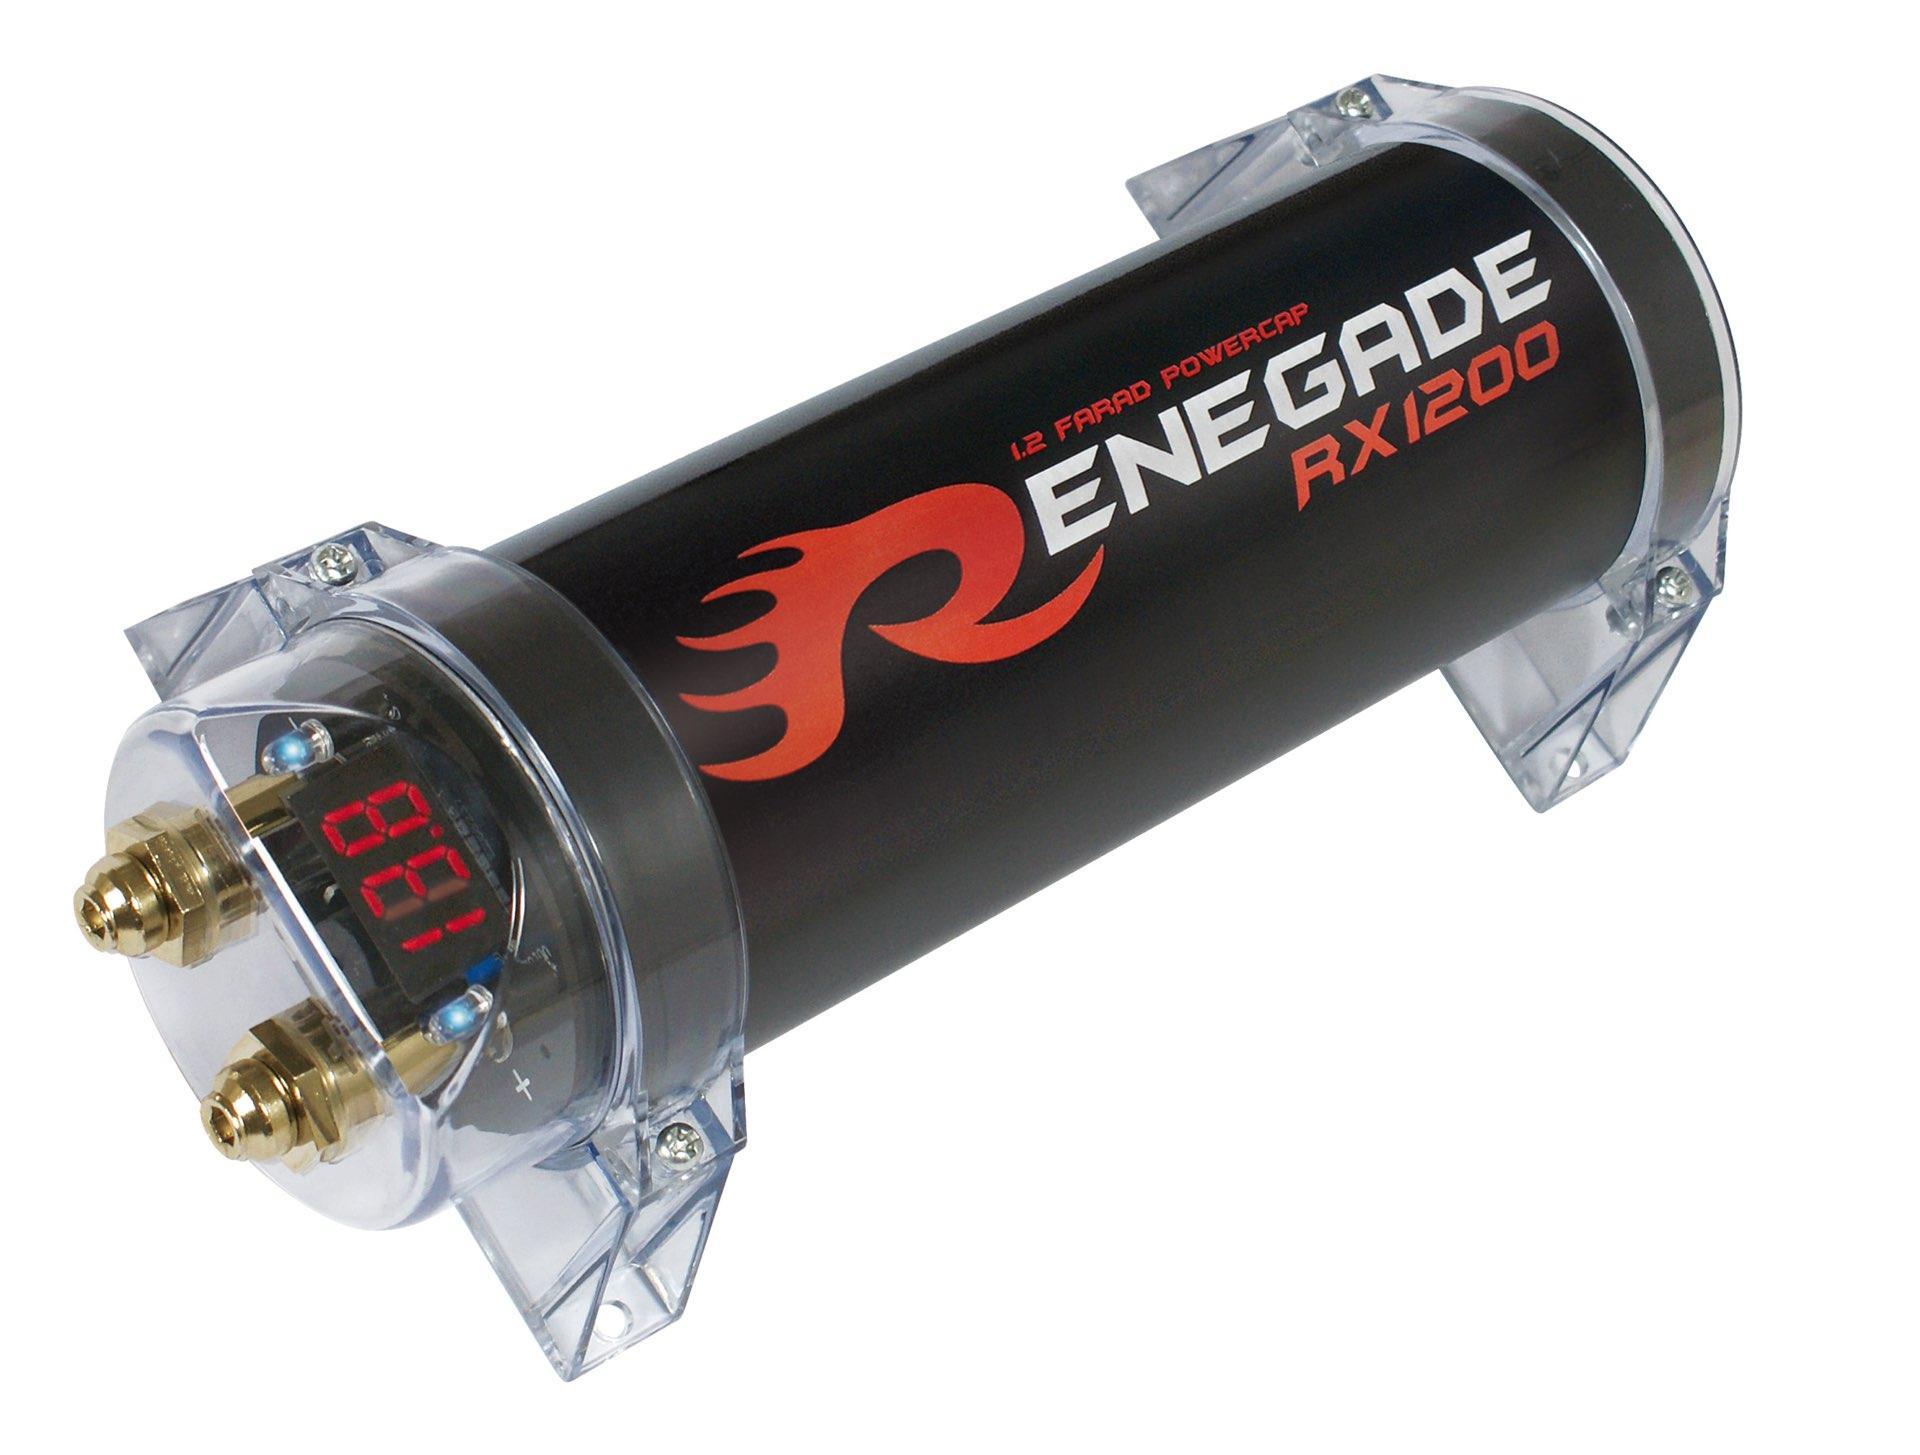 RENEGADE  RX1200 Condensatore impianto audio